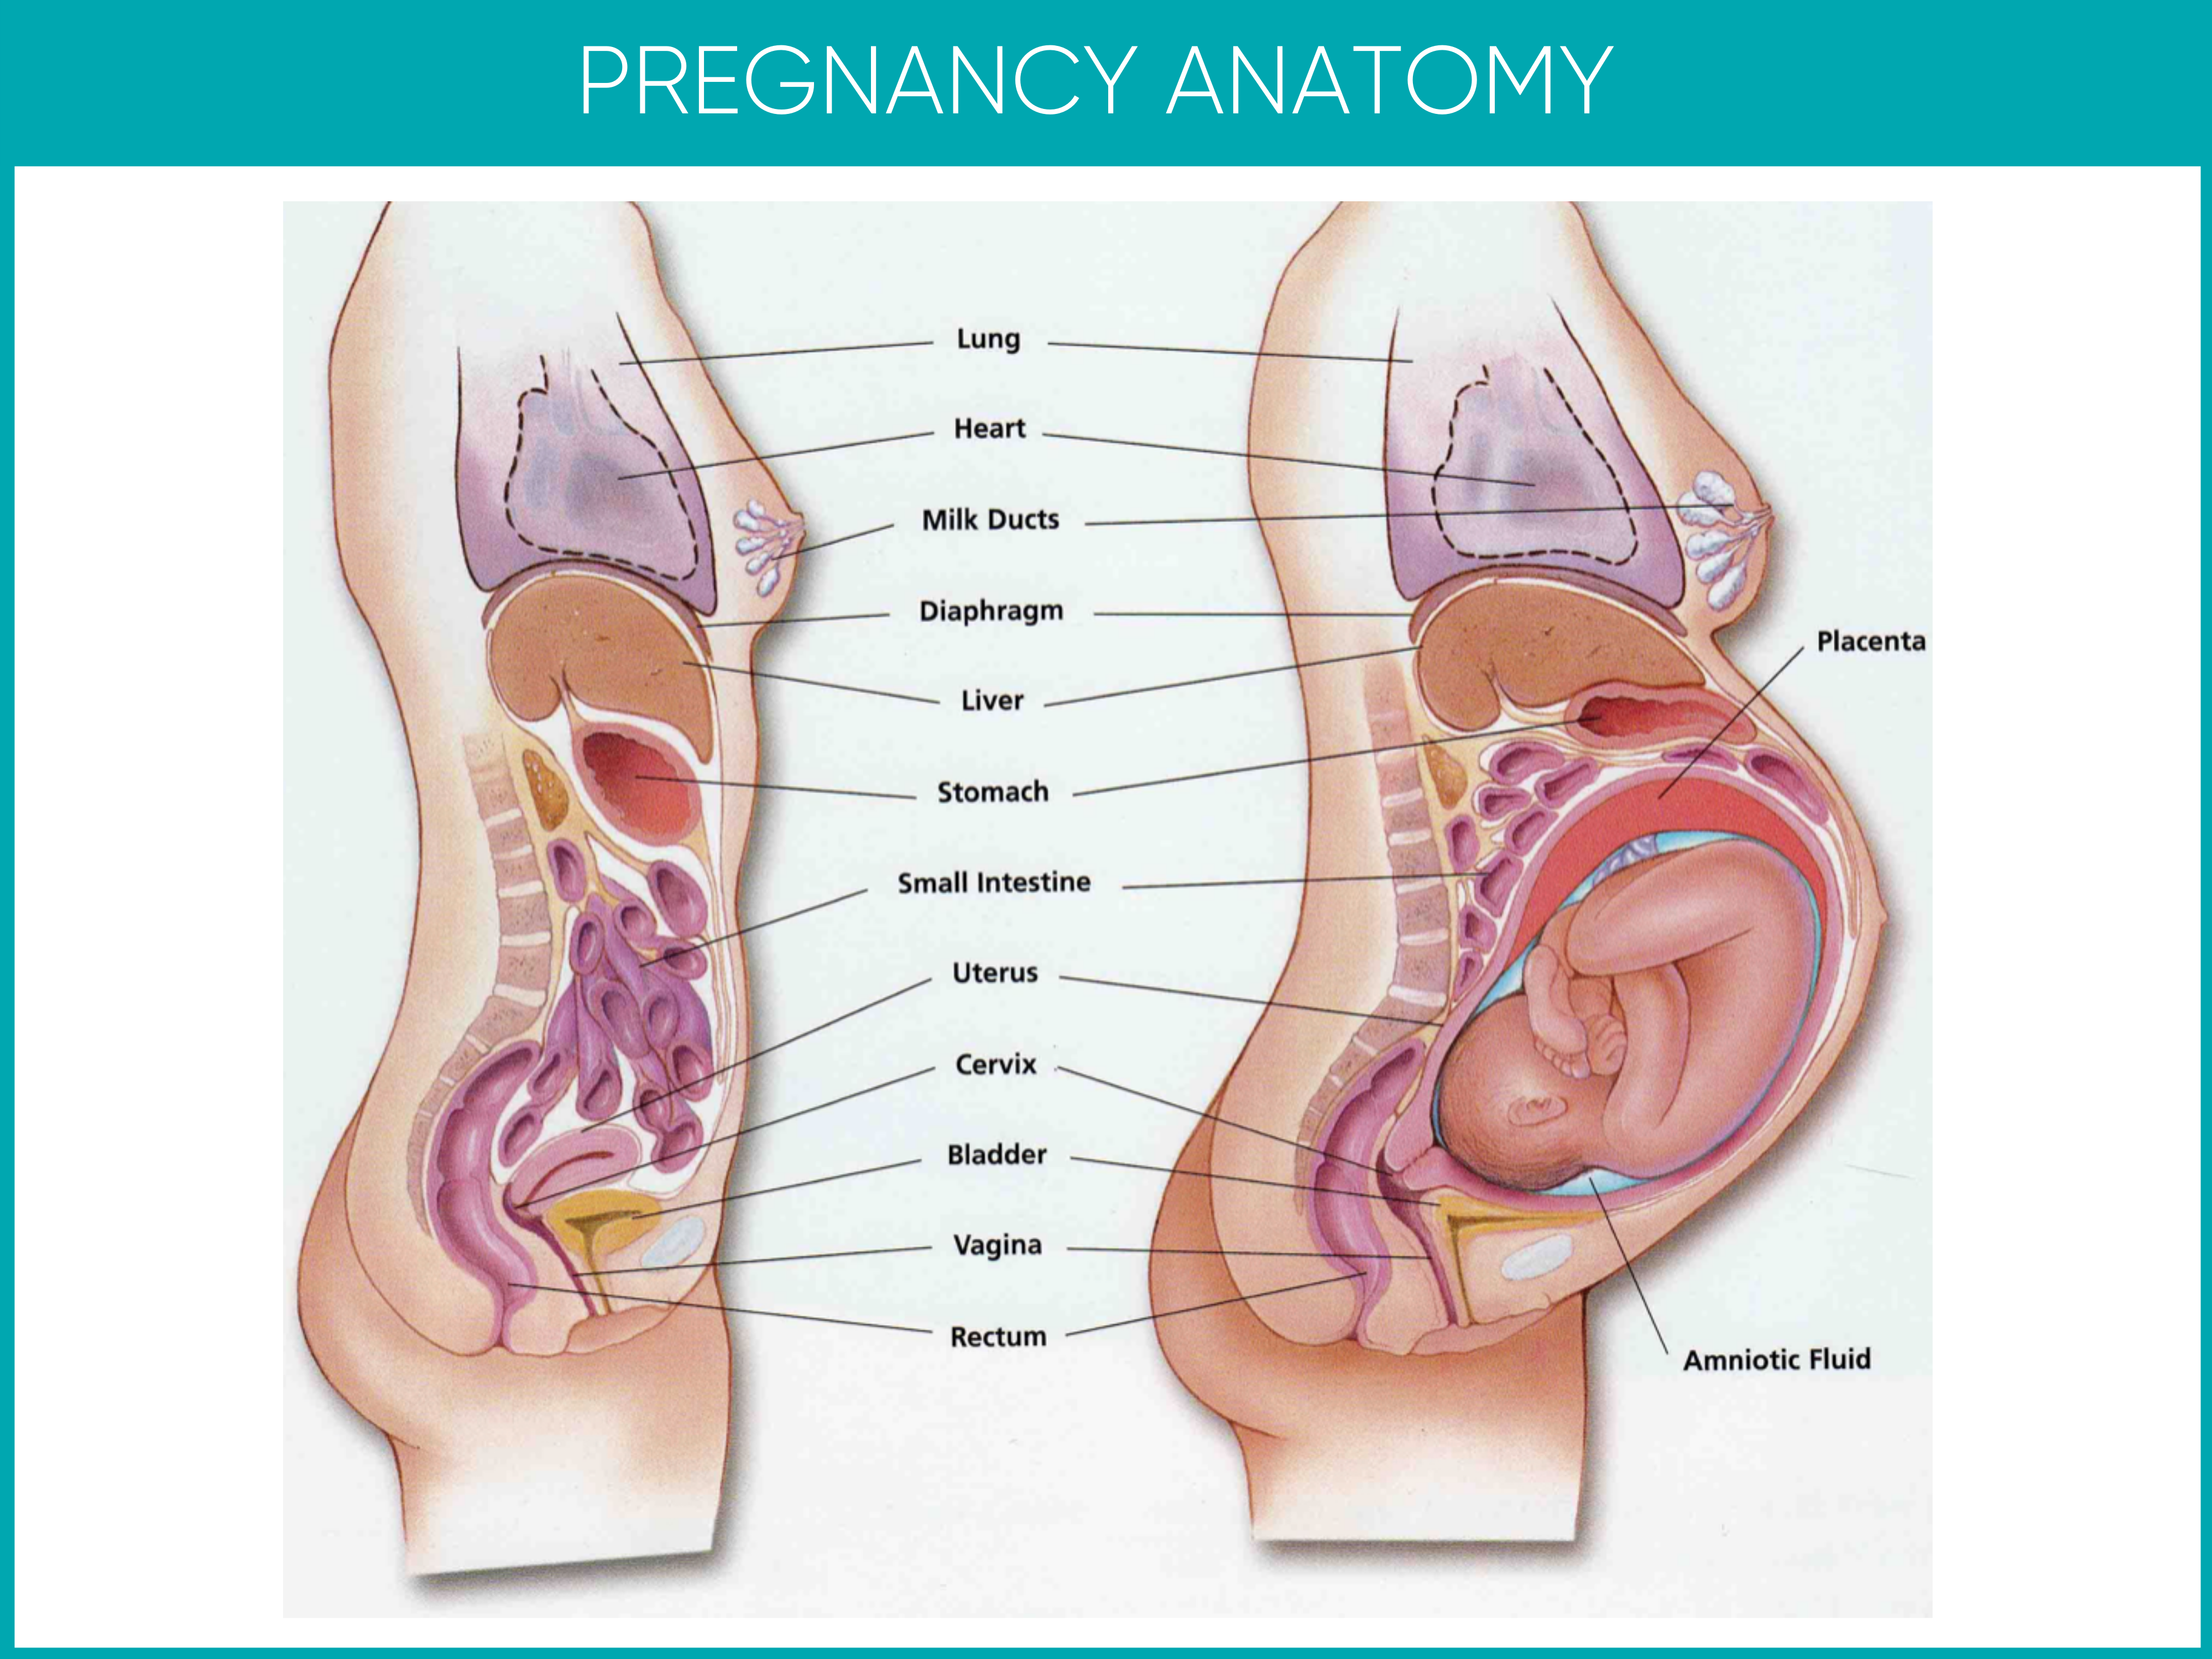 Pregnancy Anatomy